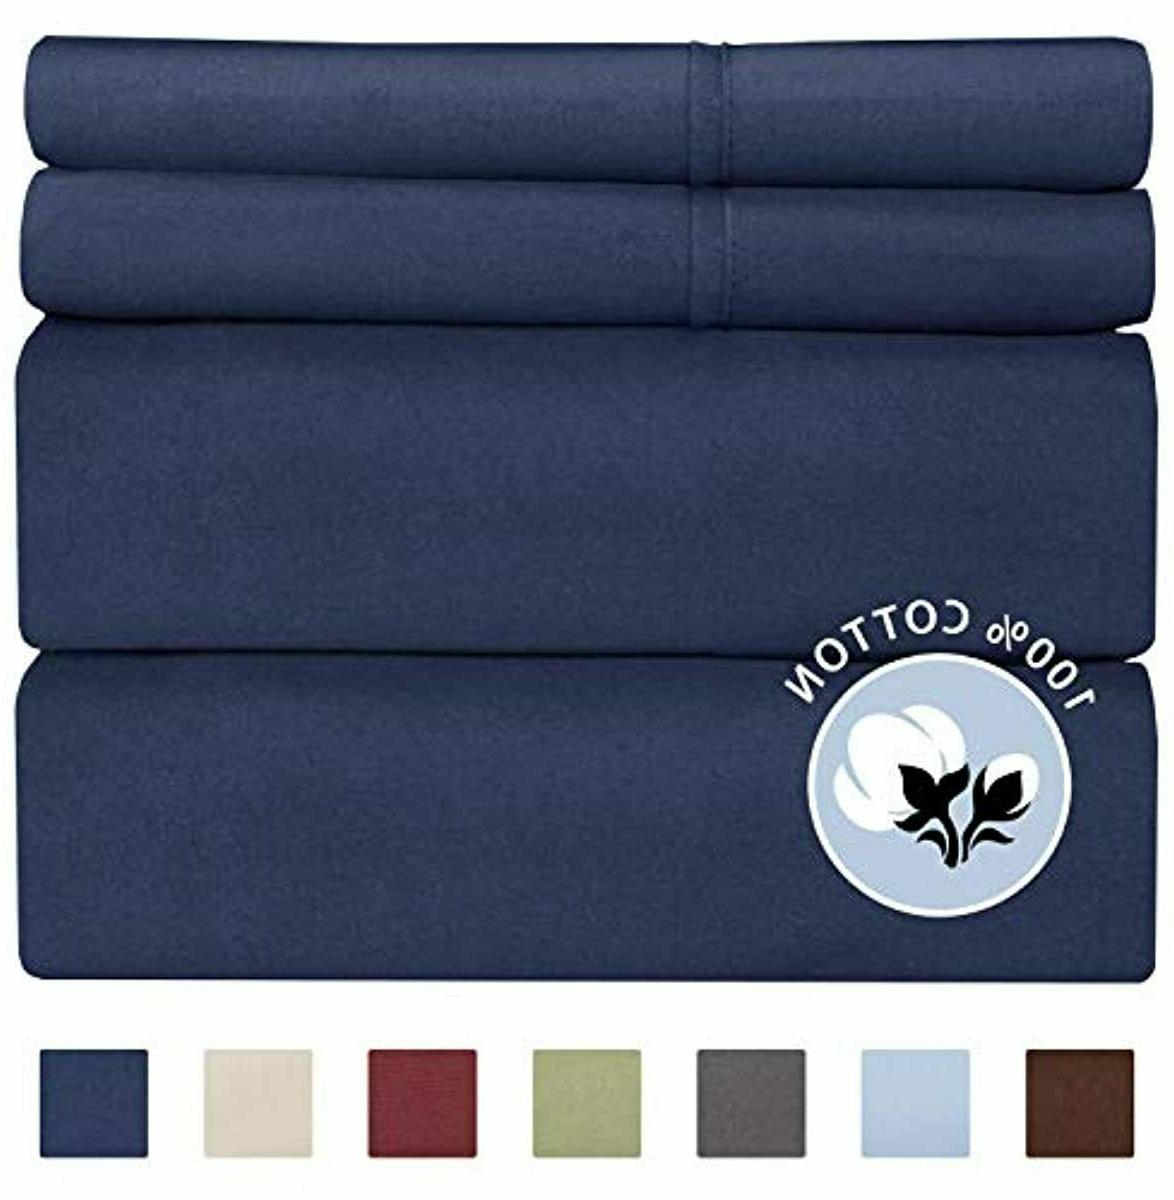 100 percent cotton split king sheets navy